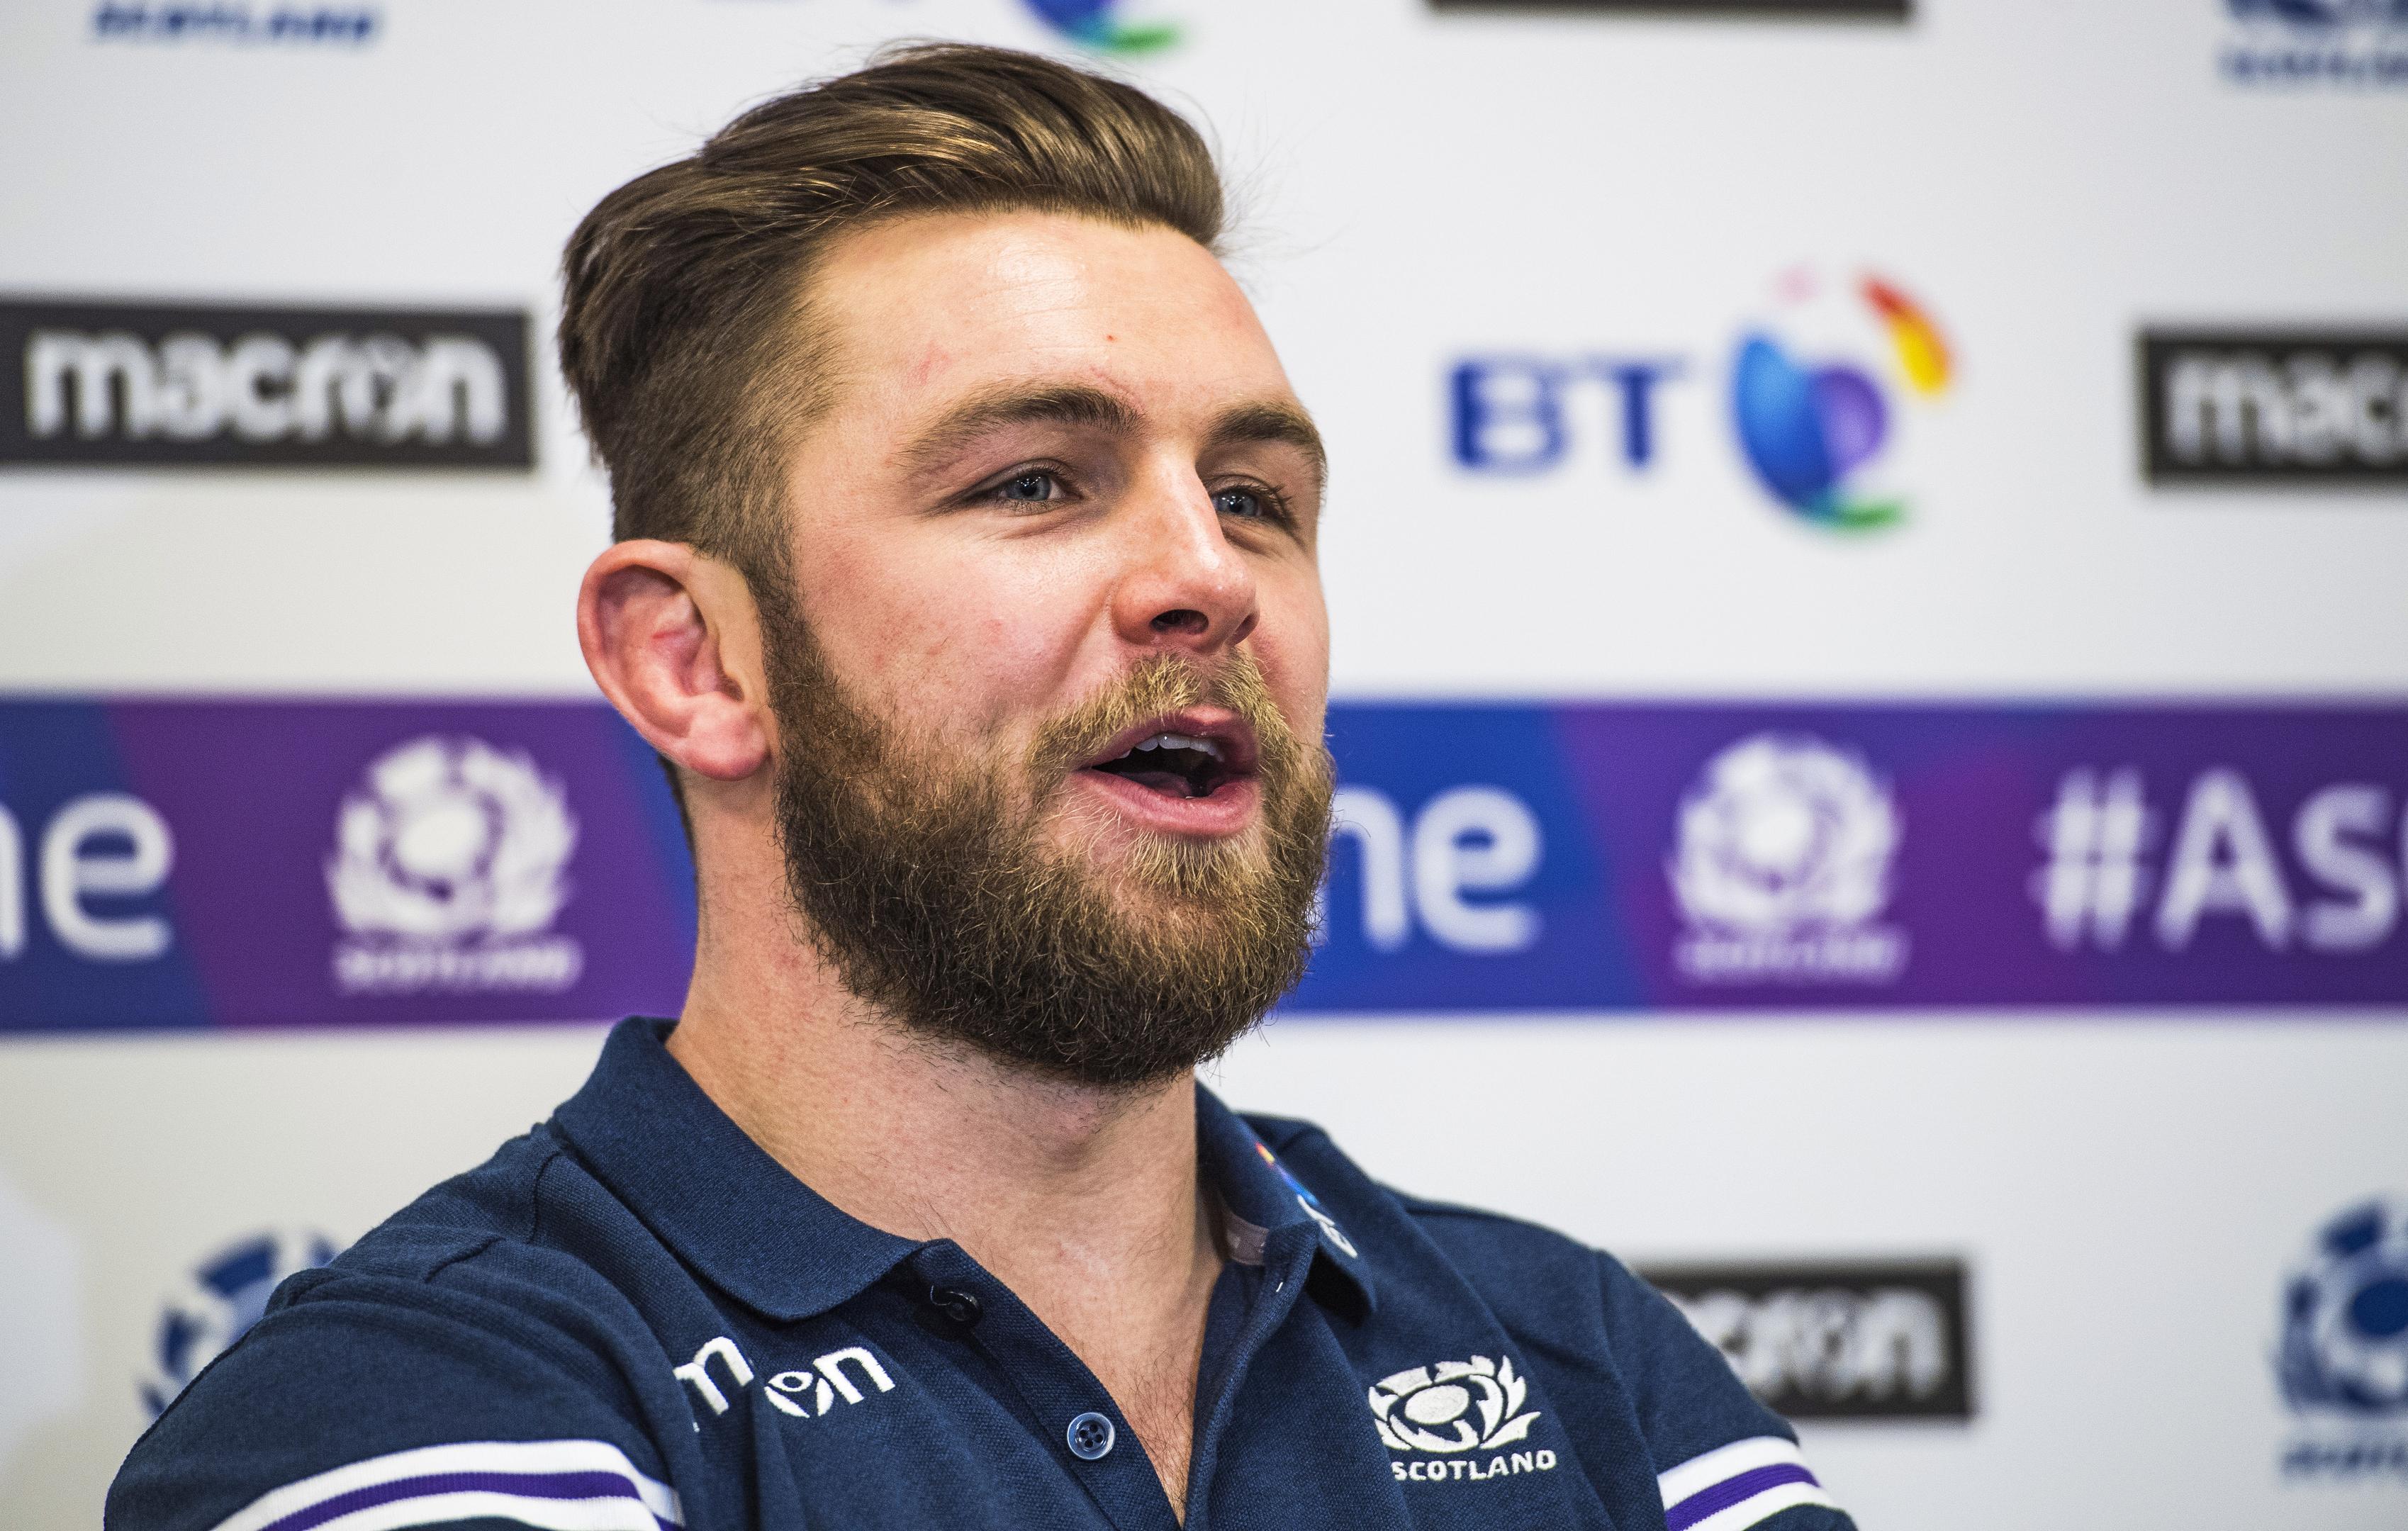 Scotland's Ryan Wilson was in good spirits talking to the media at Oriam.